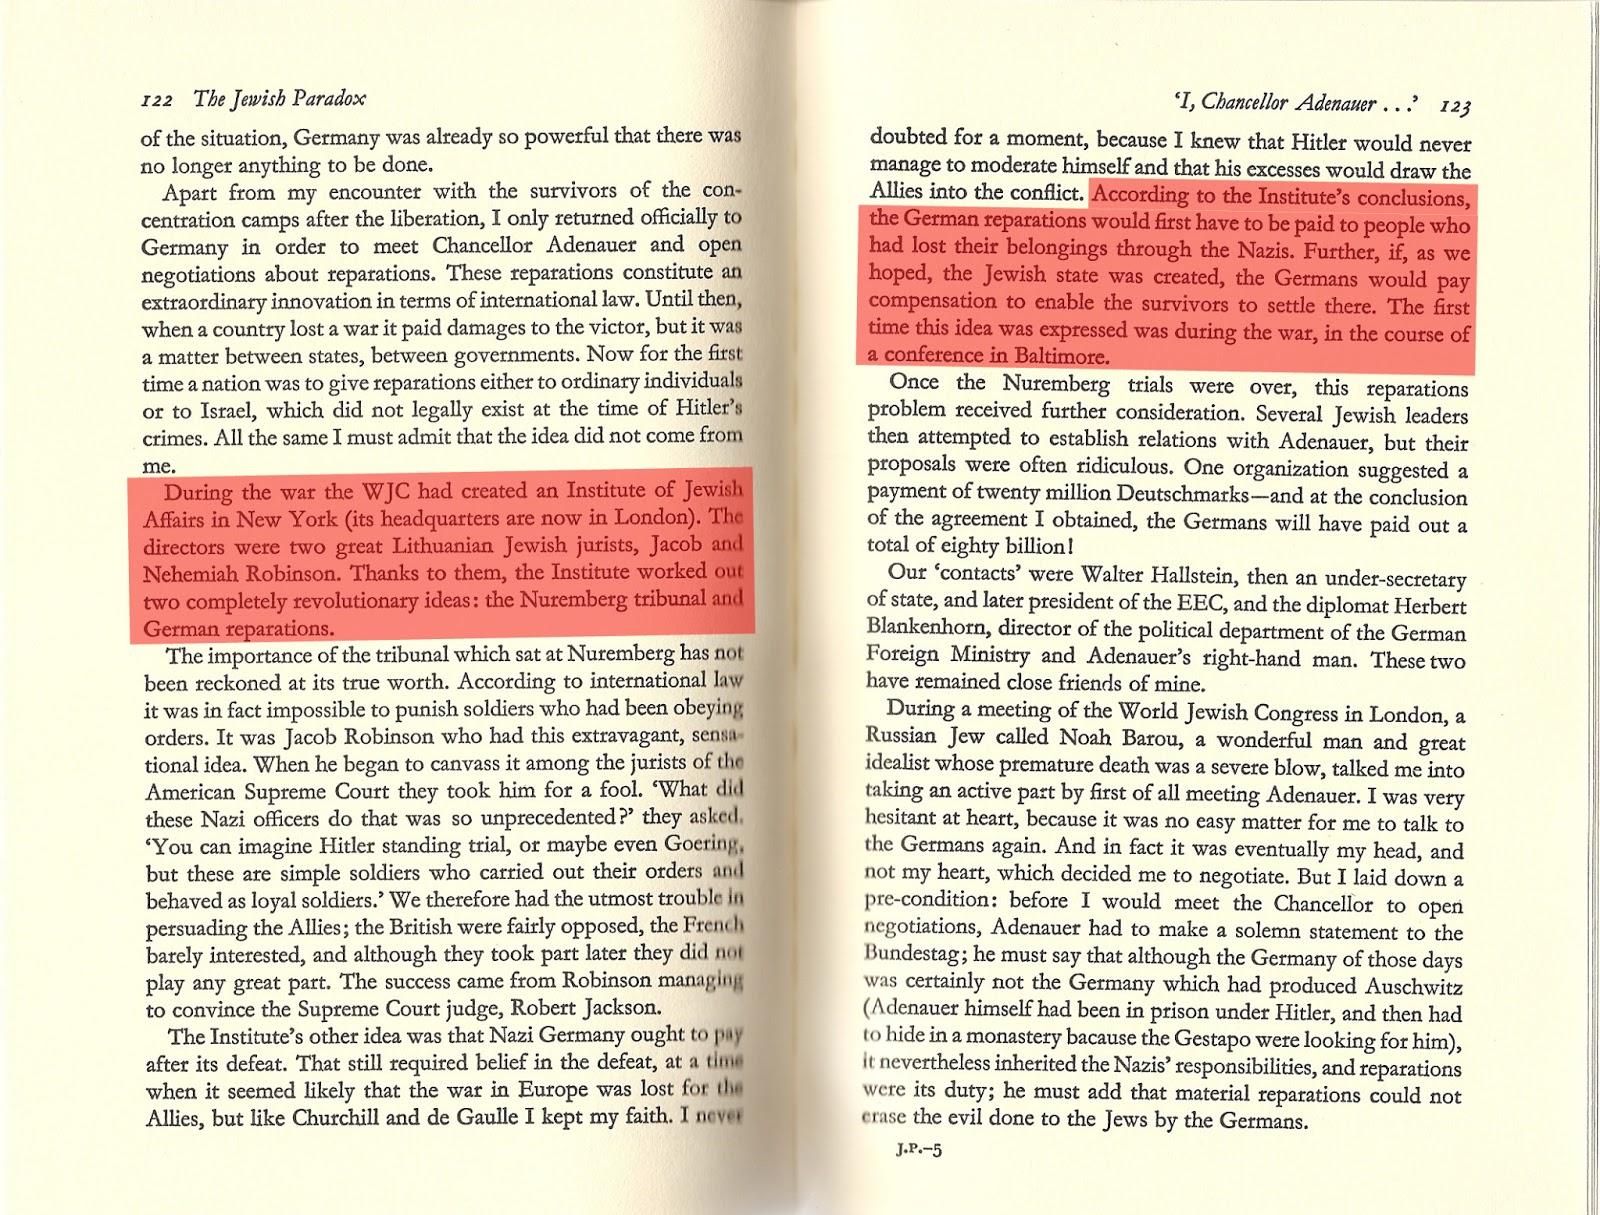 7 paragraph, 4-5 on nuremberg trials? research essay?